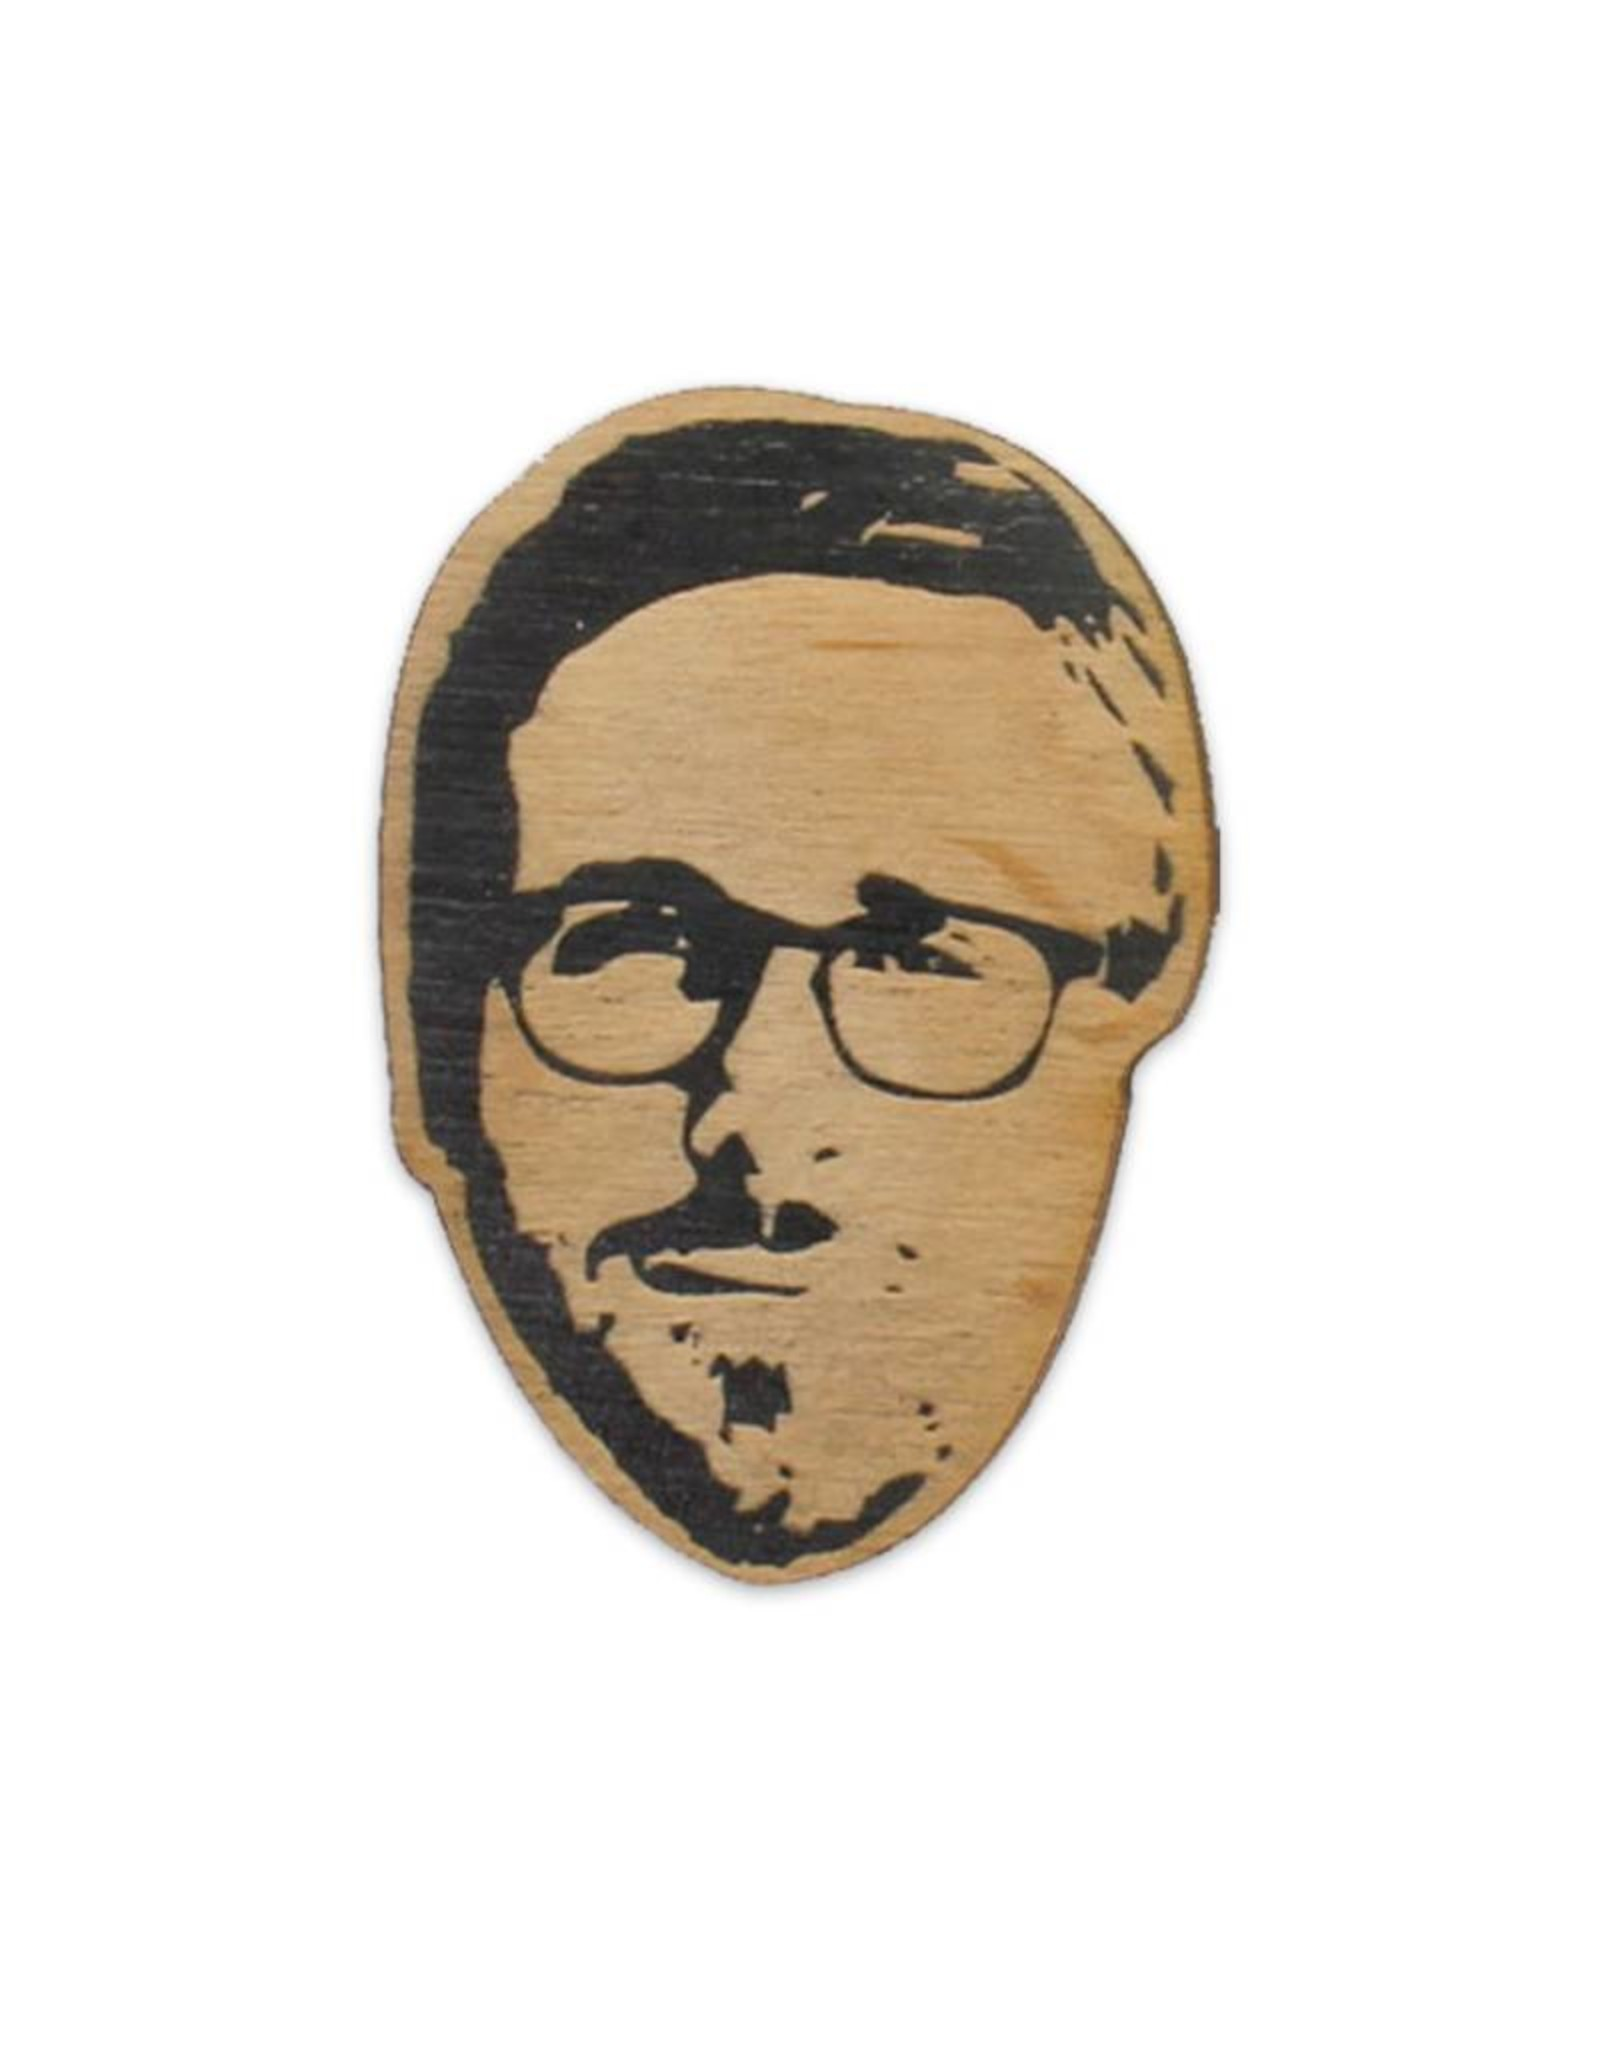 Ryan Gosling Wooden Magnet